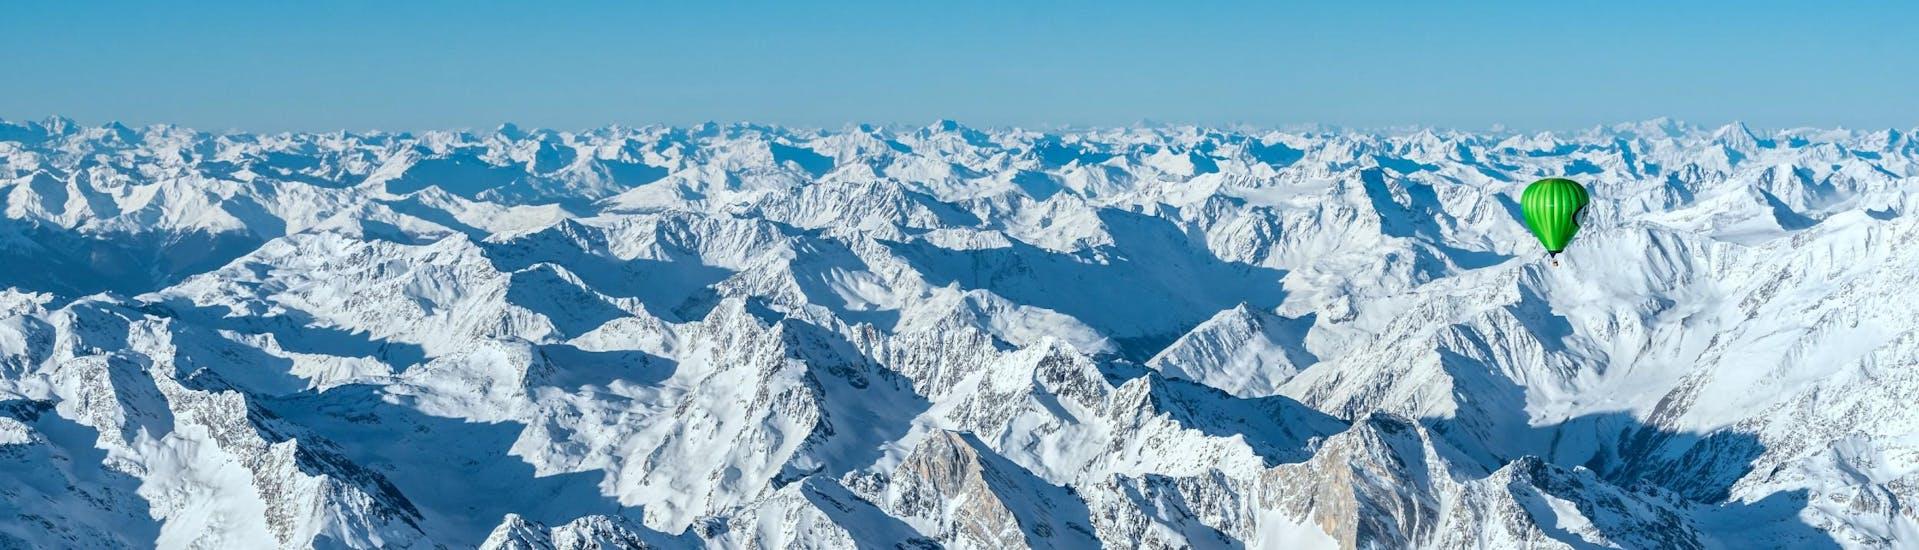 crossing-the-alps-in-a-hot-air-balloon-mountain-ballooning-hero